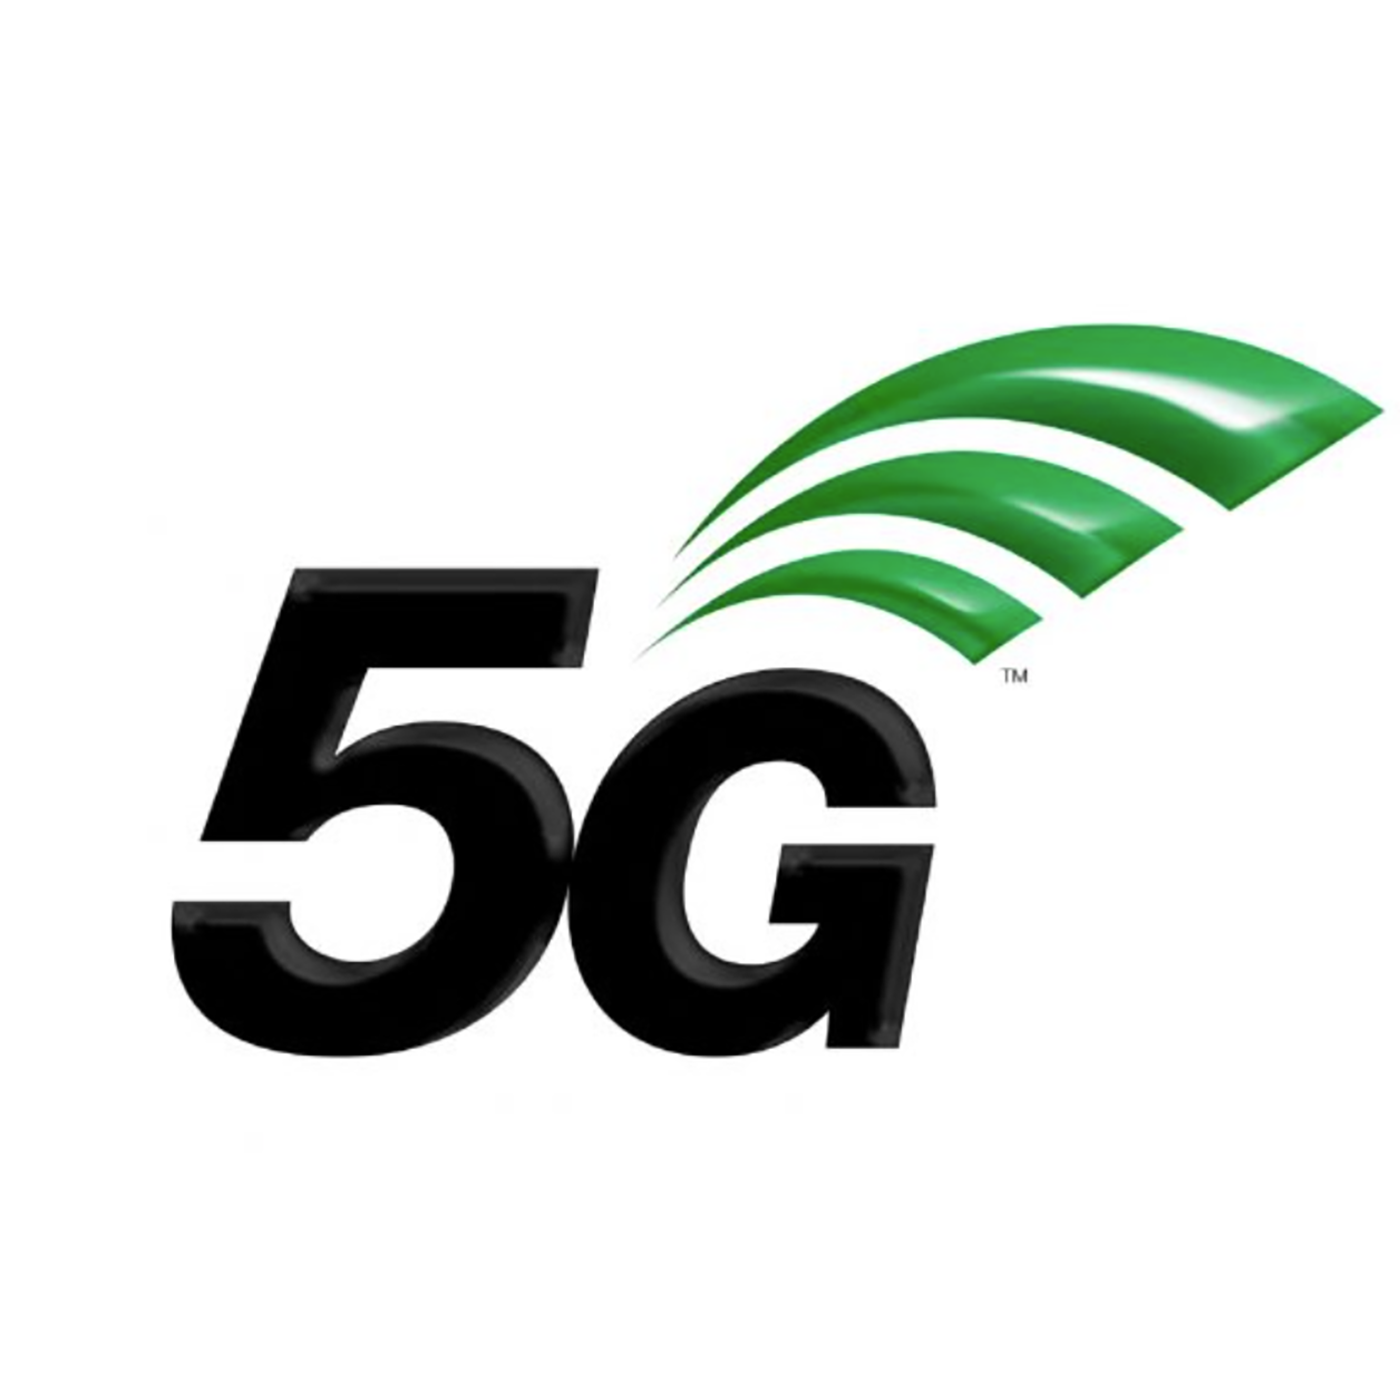 Podcast 頻道:這集絕對得罪廠商啦!算了反正不得罪也不一定會找(哭泣),就好好聊聊現在真的可以辦 5G 門號嗎?可以買 5G 手機嗎? Powered by Firstory Hosting